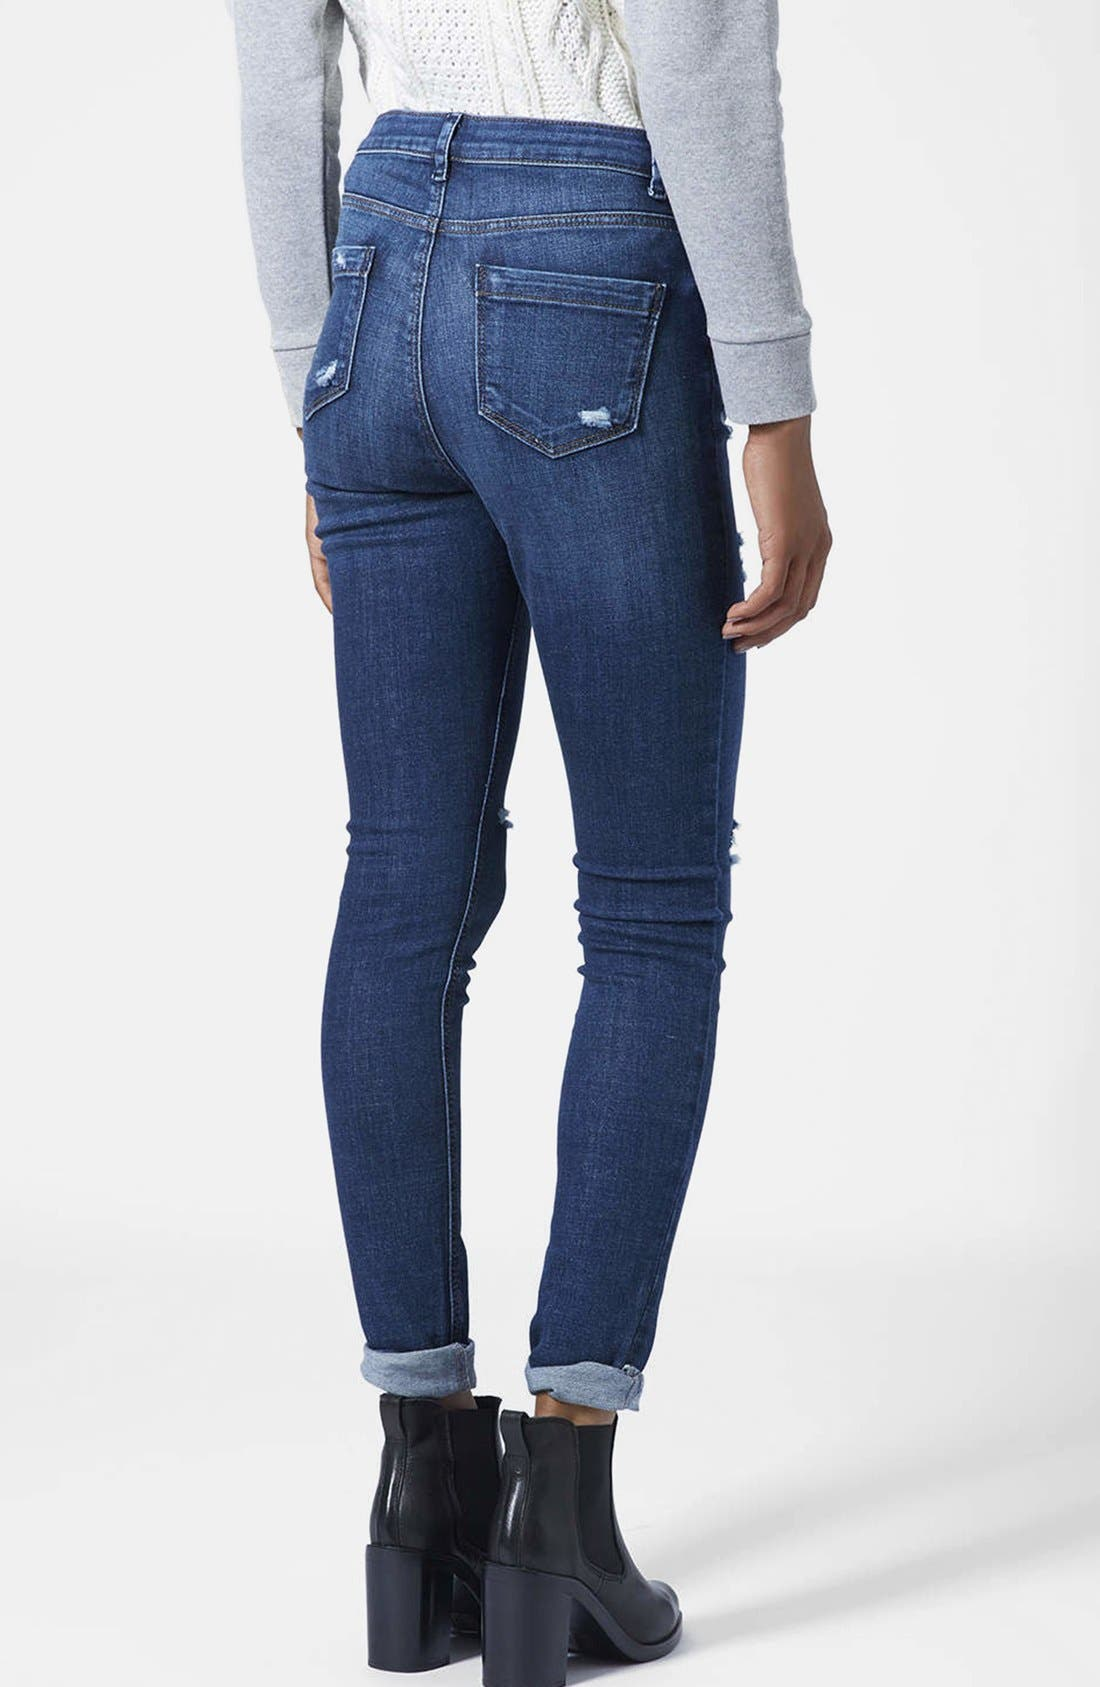 Moto Ripped Skinny Jeans,                             Alternate thumbnail 2, color,                             Dark Denim